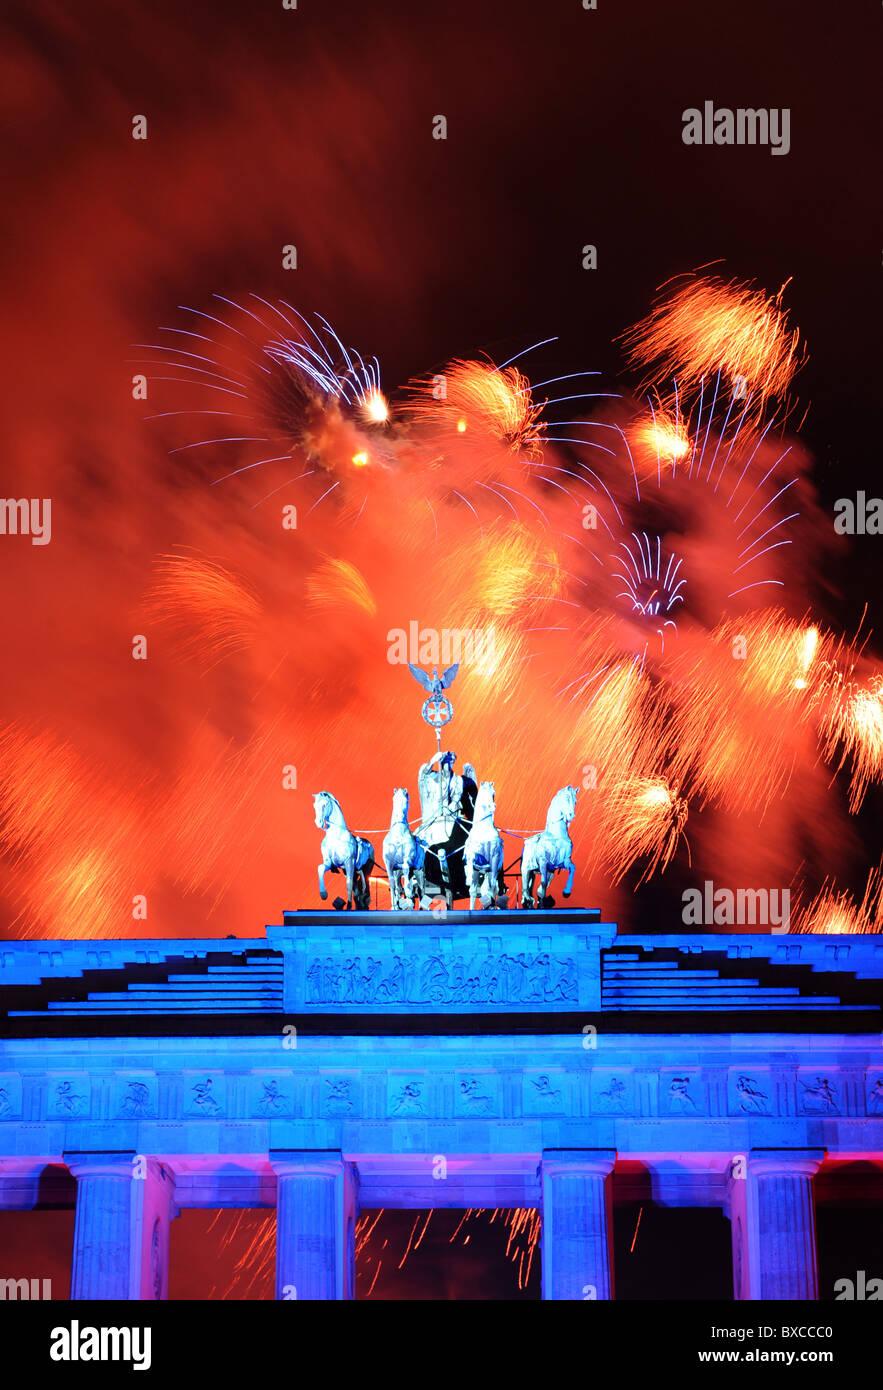 Fireworks over the Brandenburg Gate, Berlin, Germany Stock Photo